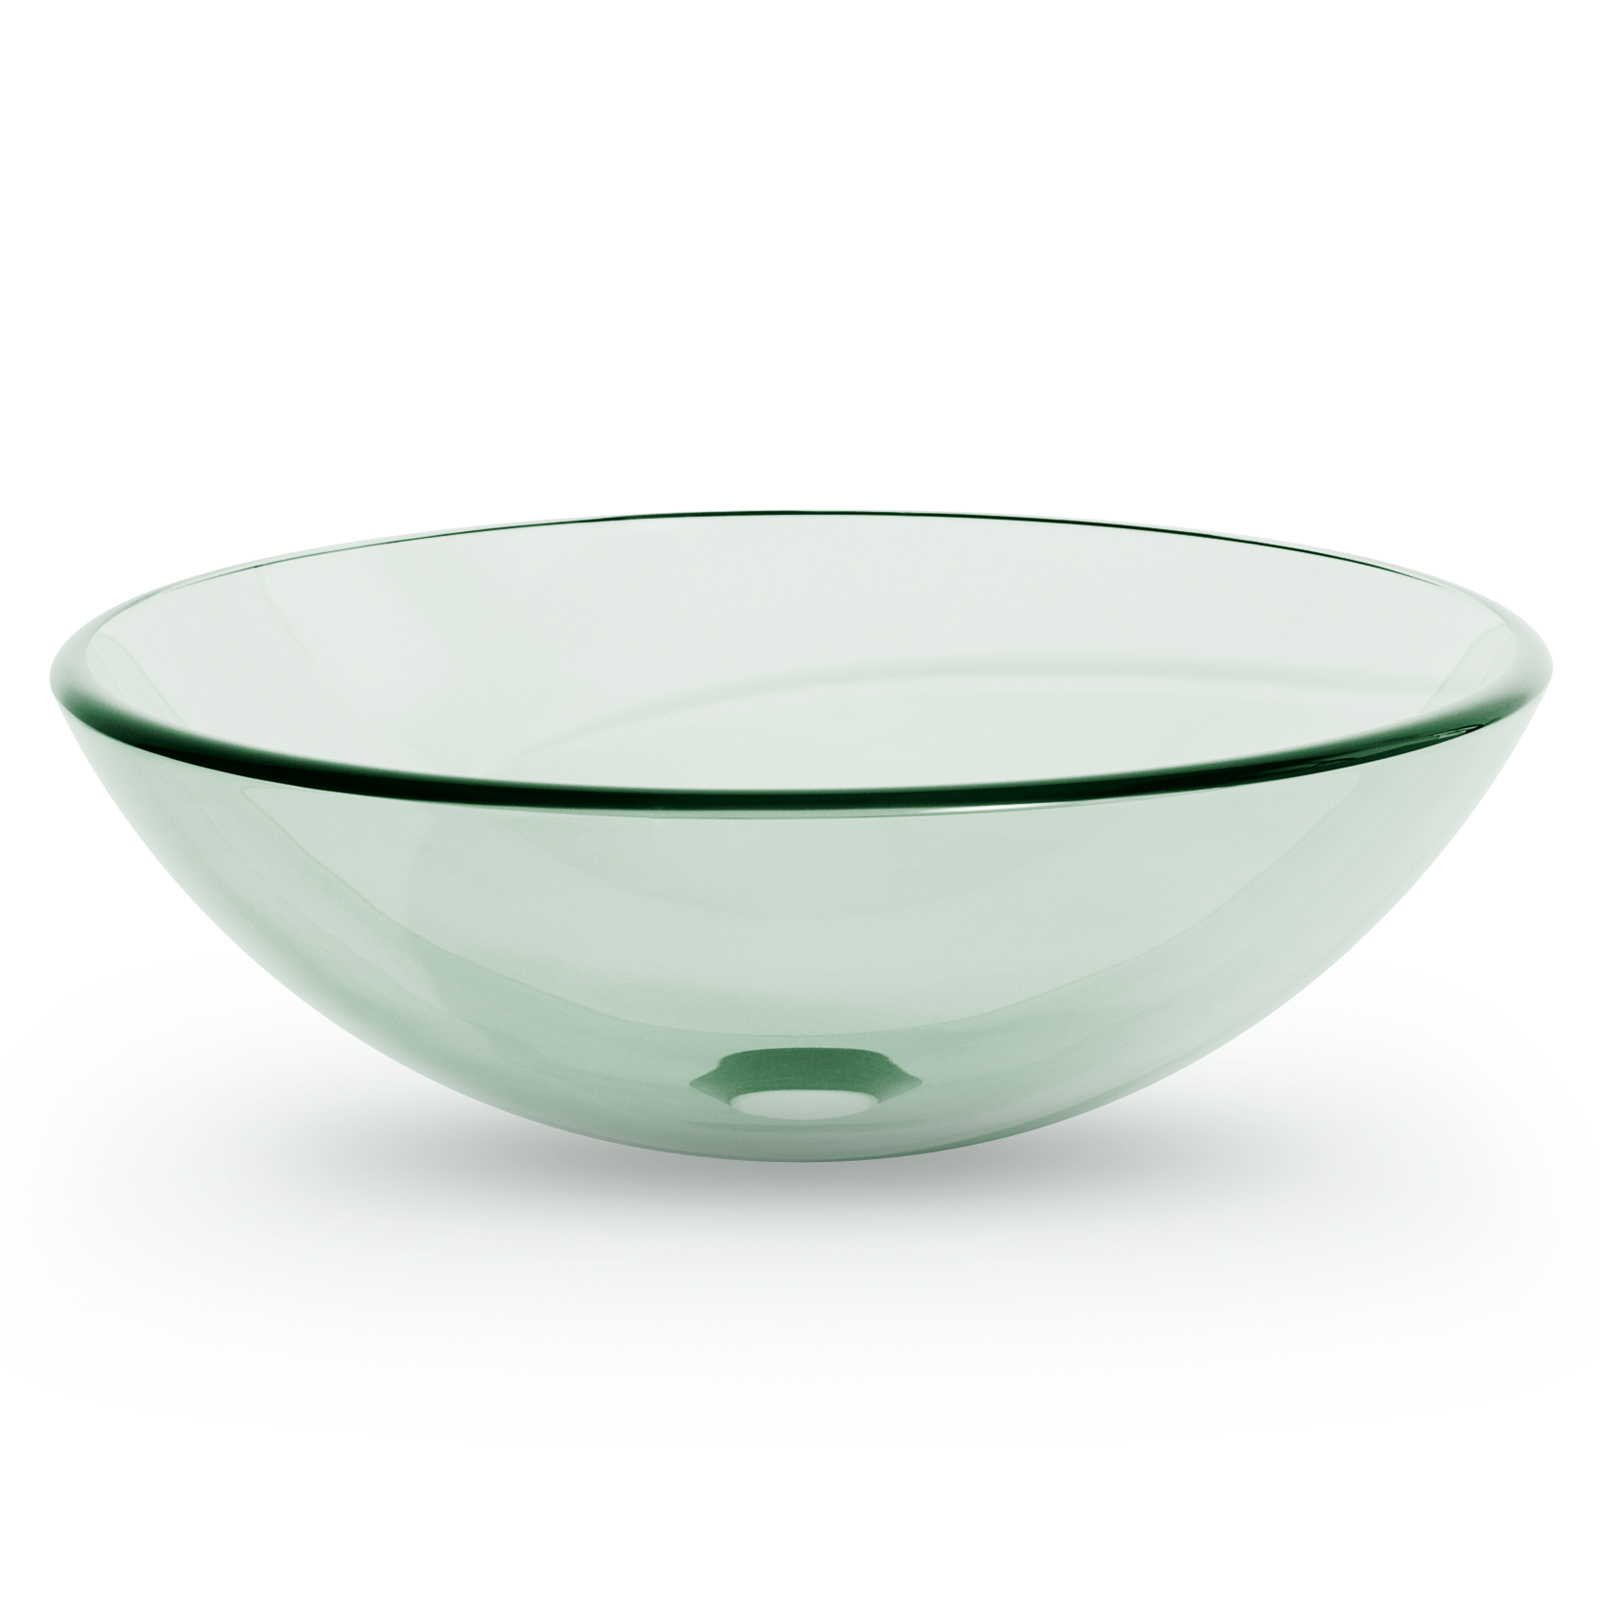 Miligoré Modern Glass Vessel Sink - Above Counter Bathroom Vanity Basin Bowl - Round Clear